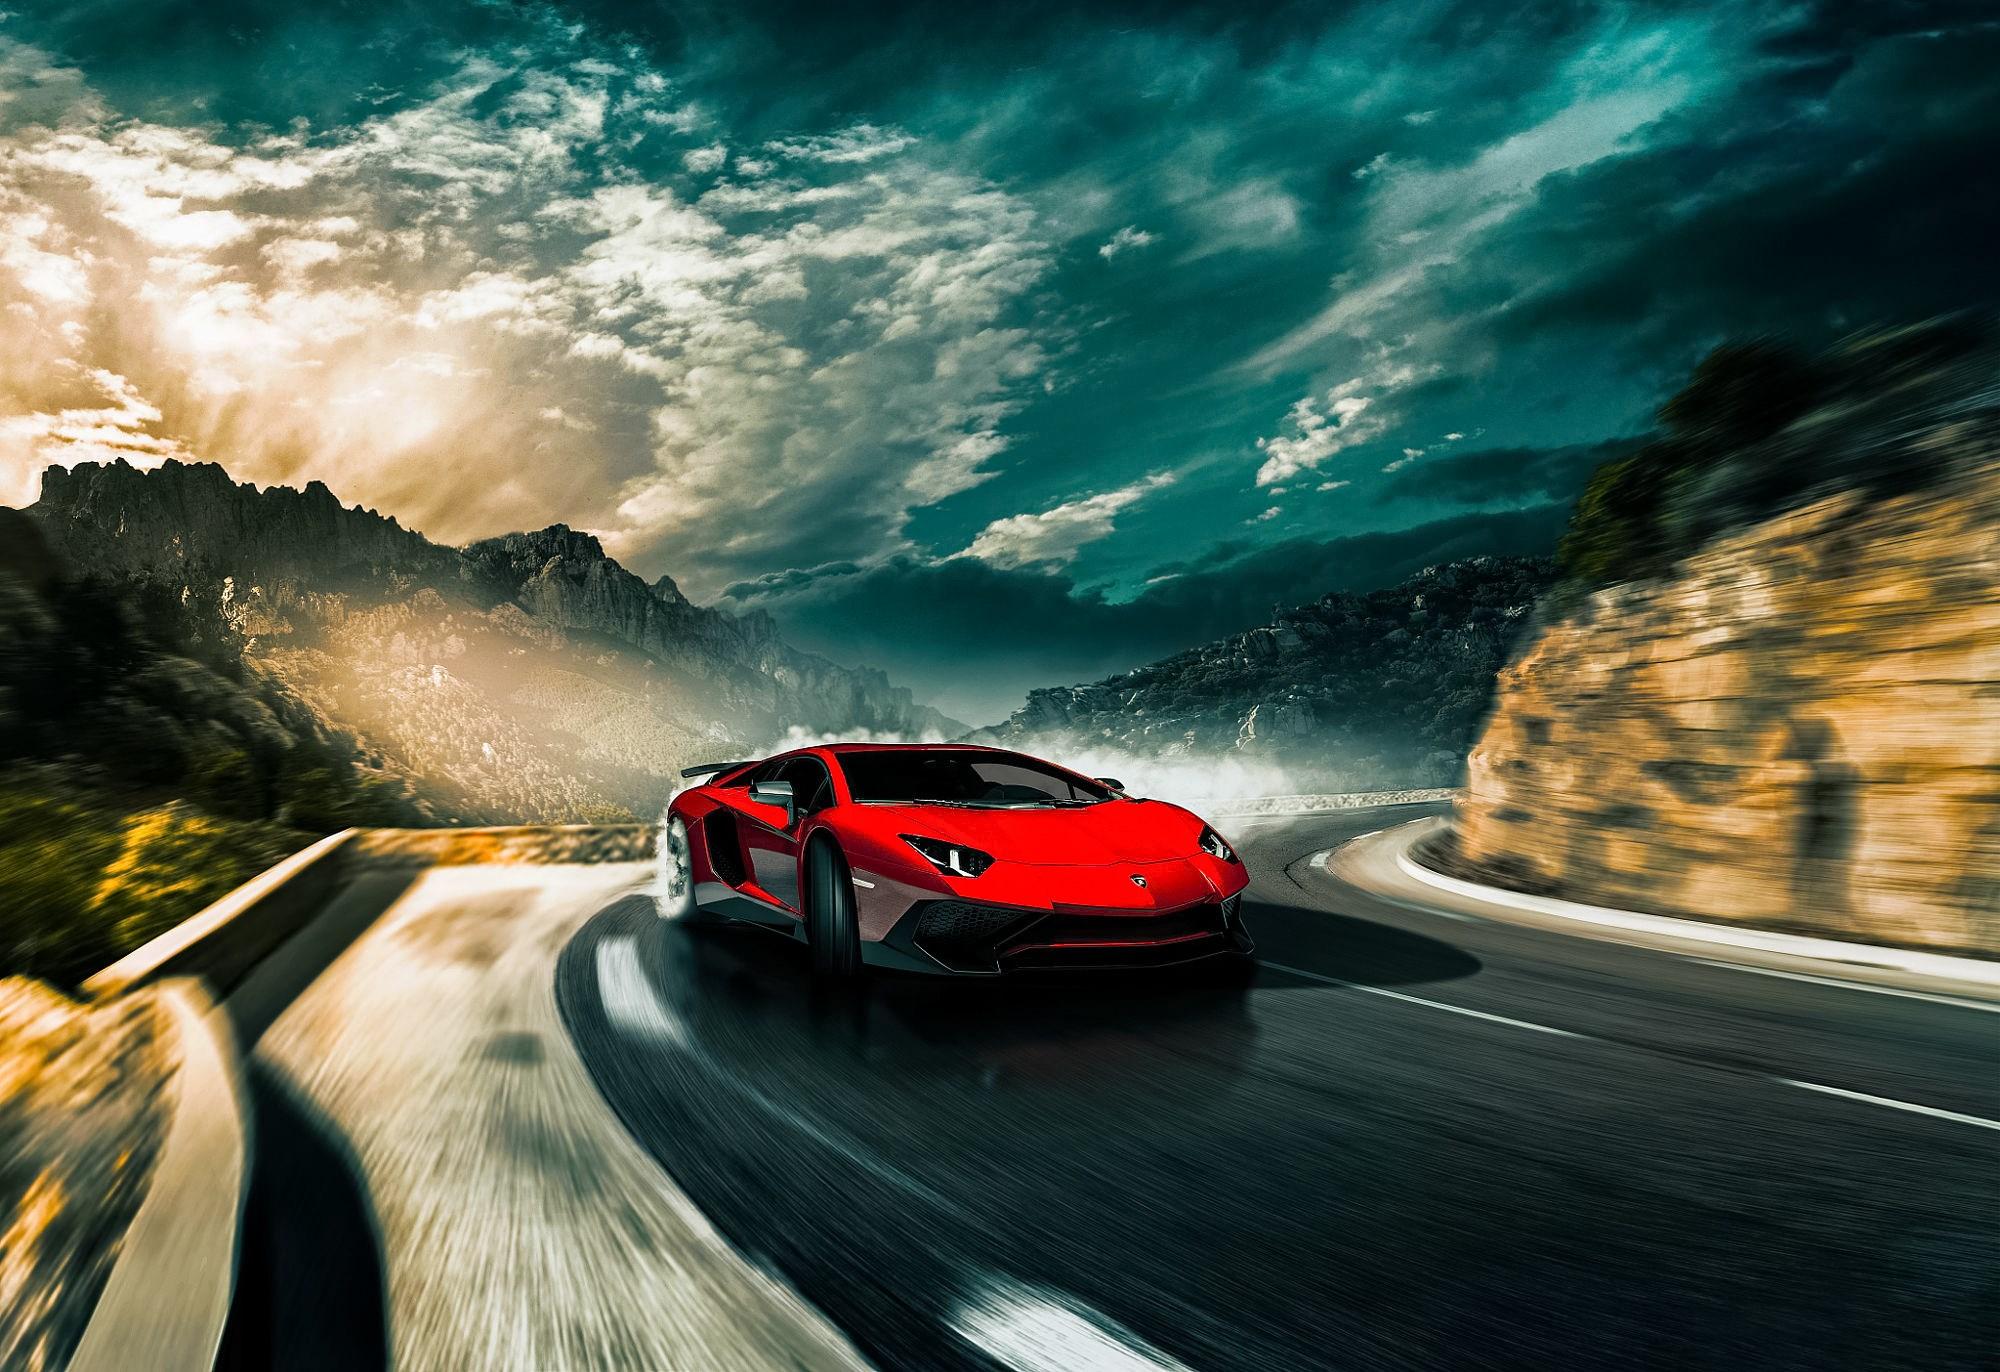 lamborghini aventador sv drifting hd cars 4k wallpapers images